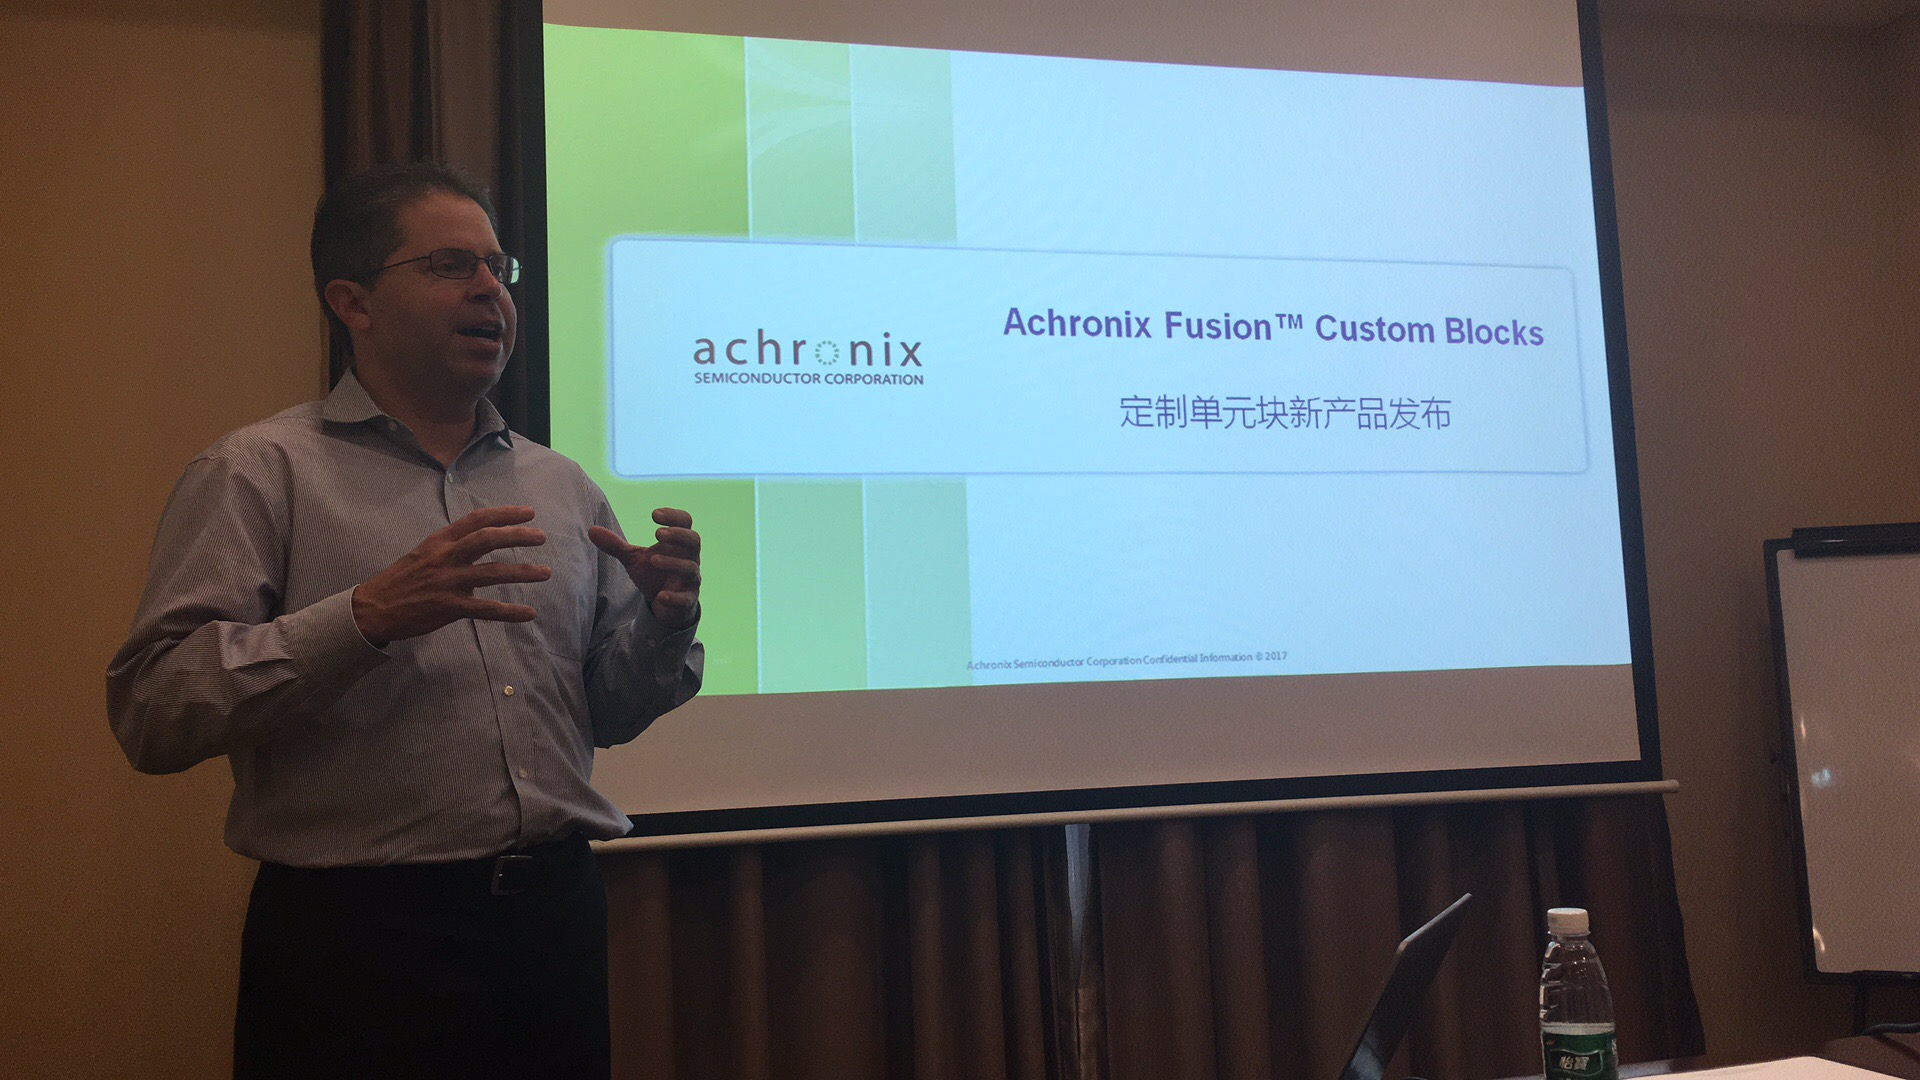 Achronix的Speedcore™ Custom Blocks定制单元块为数据加速系统再添动力